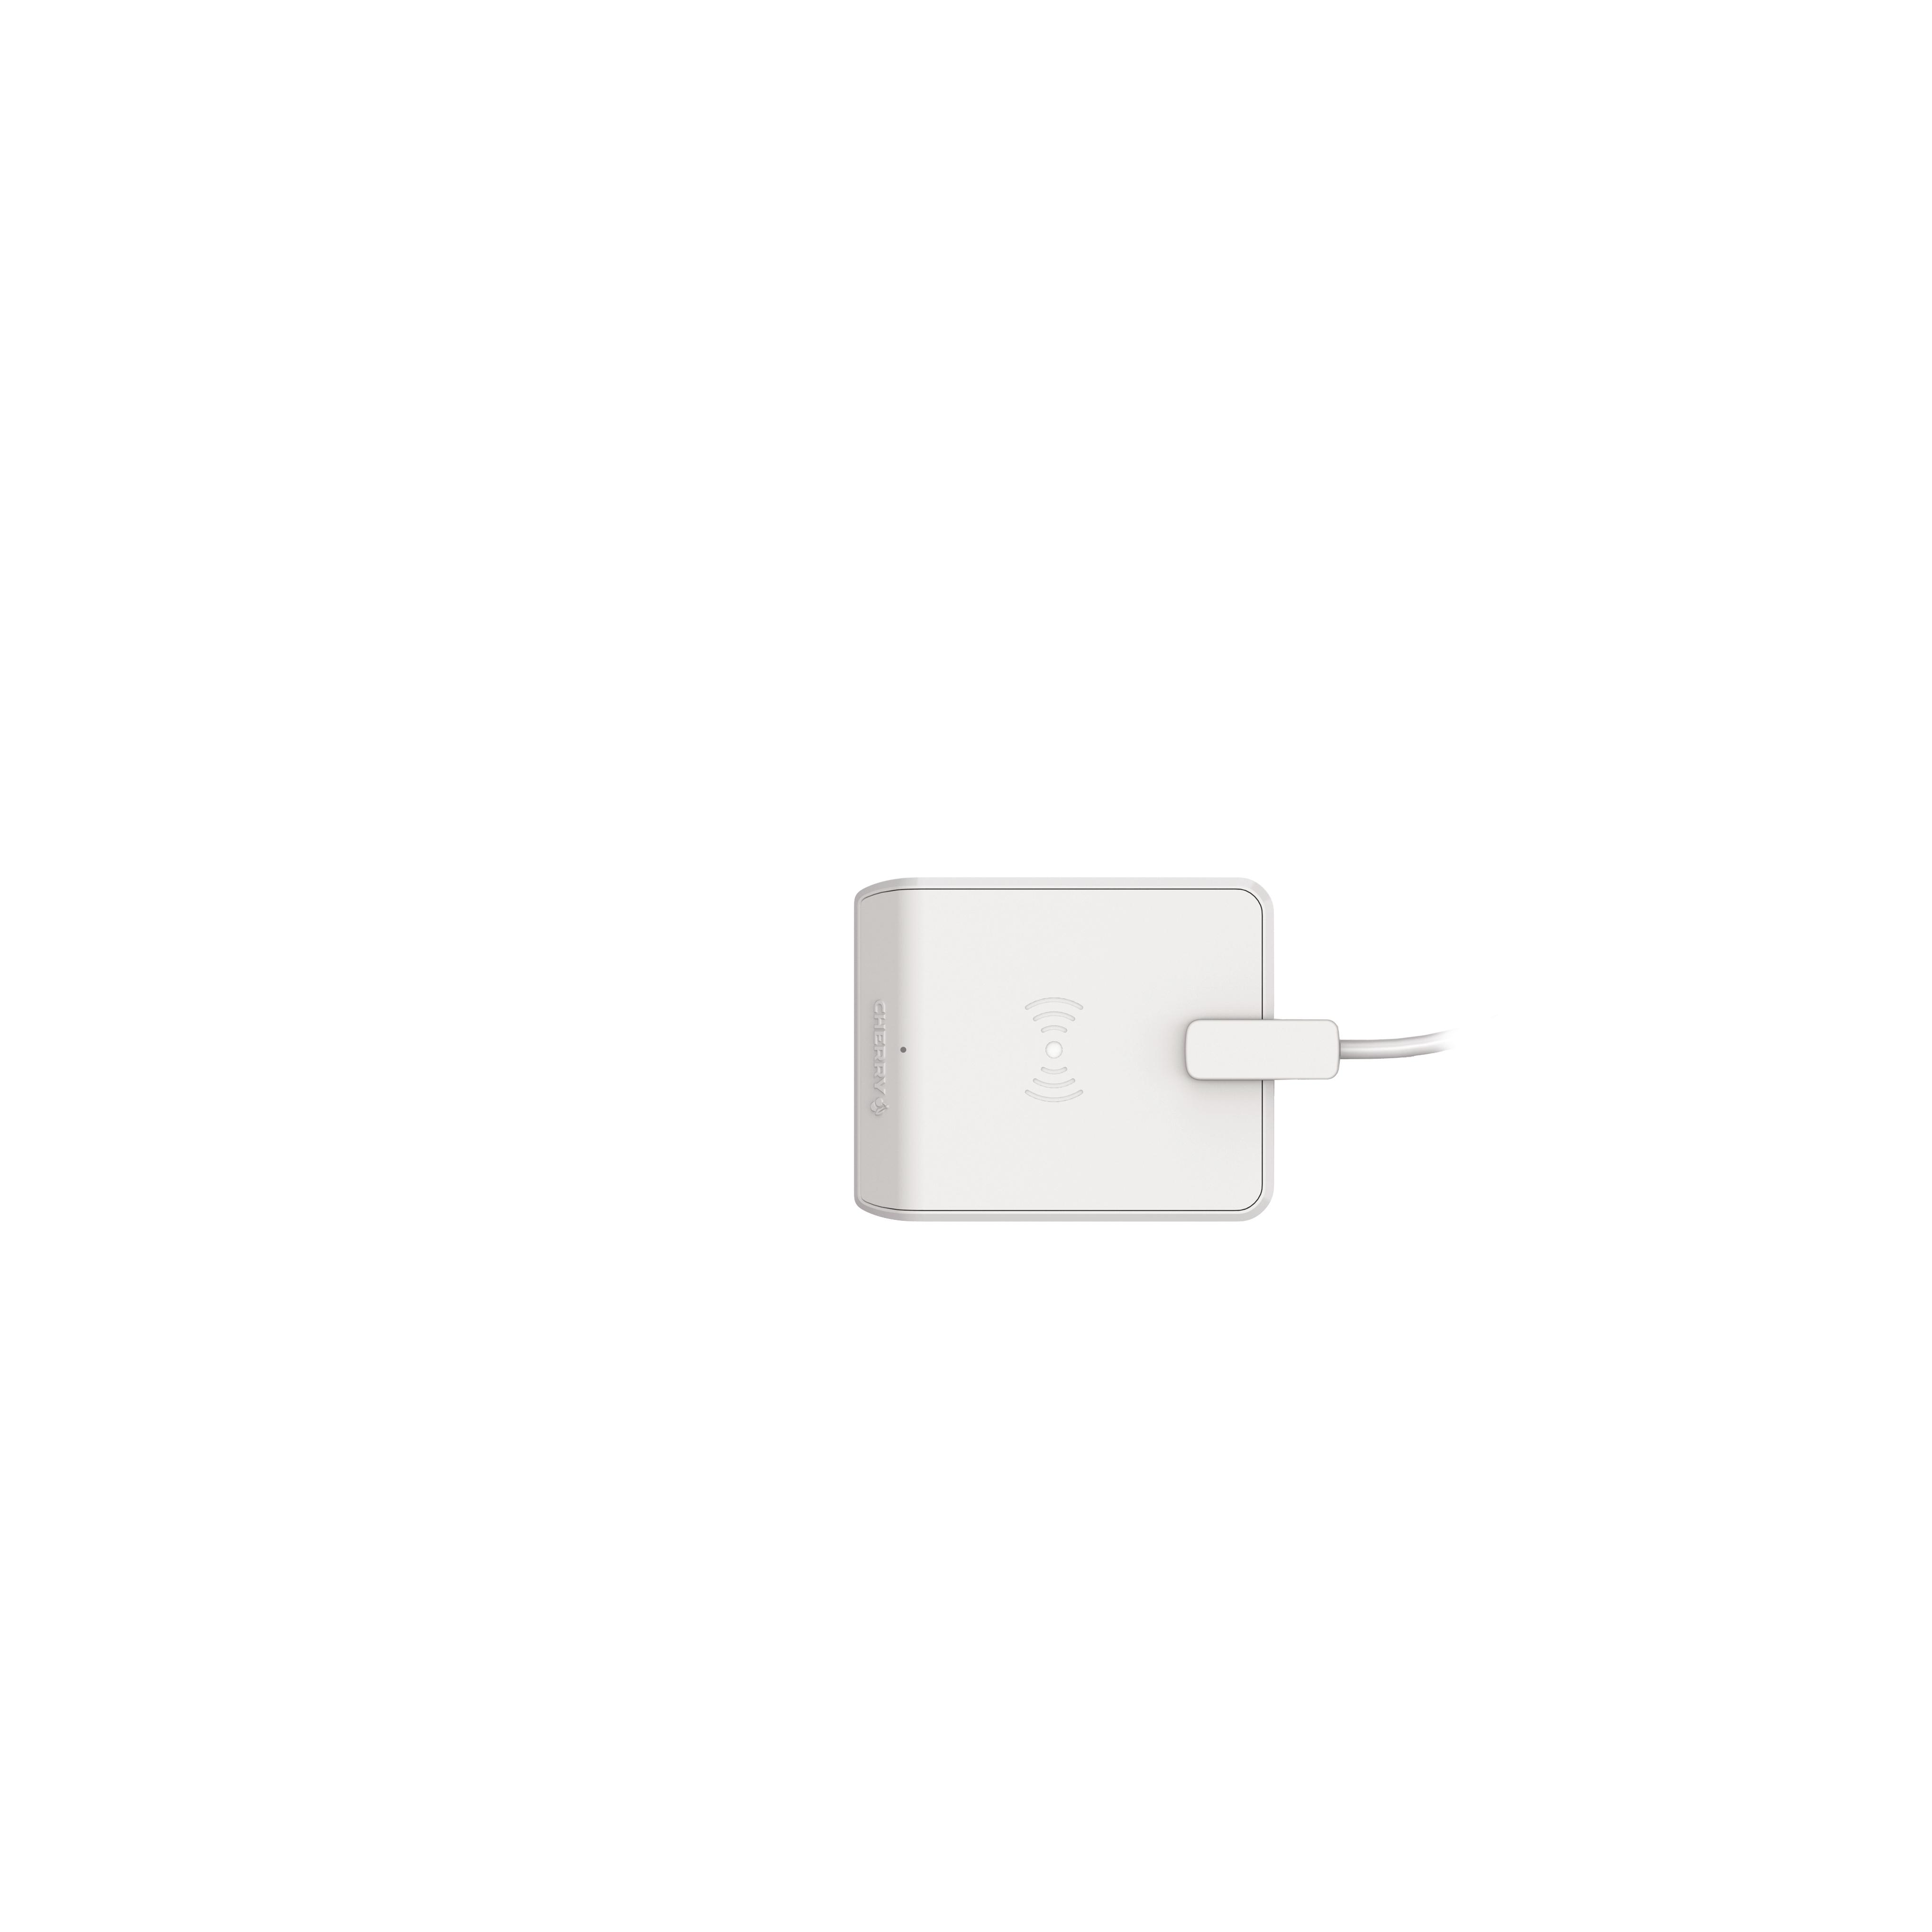 Cherry TC 1200 Innenraum USB 2.0 Grau Smart-Card-Lesegerät